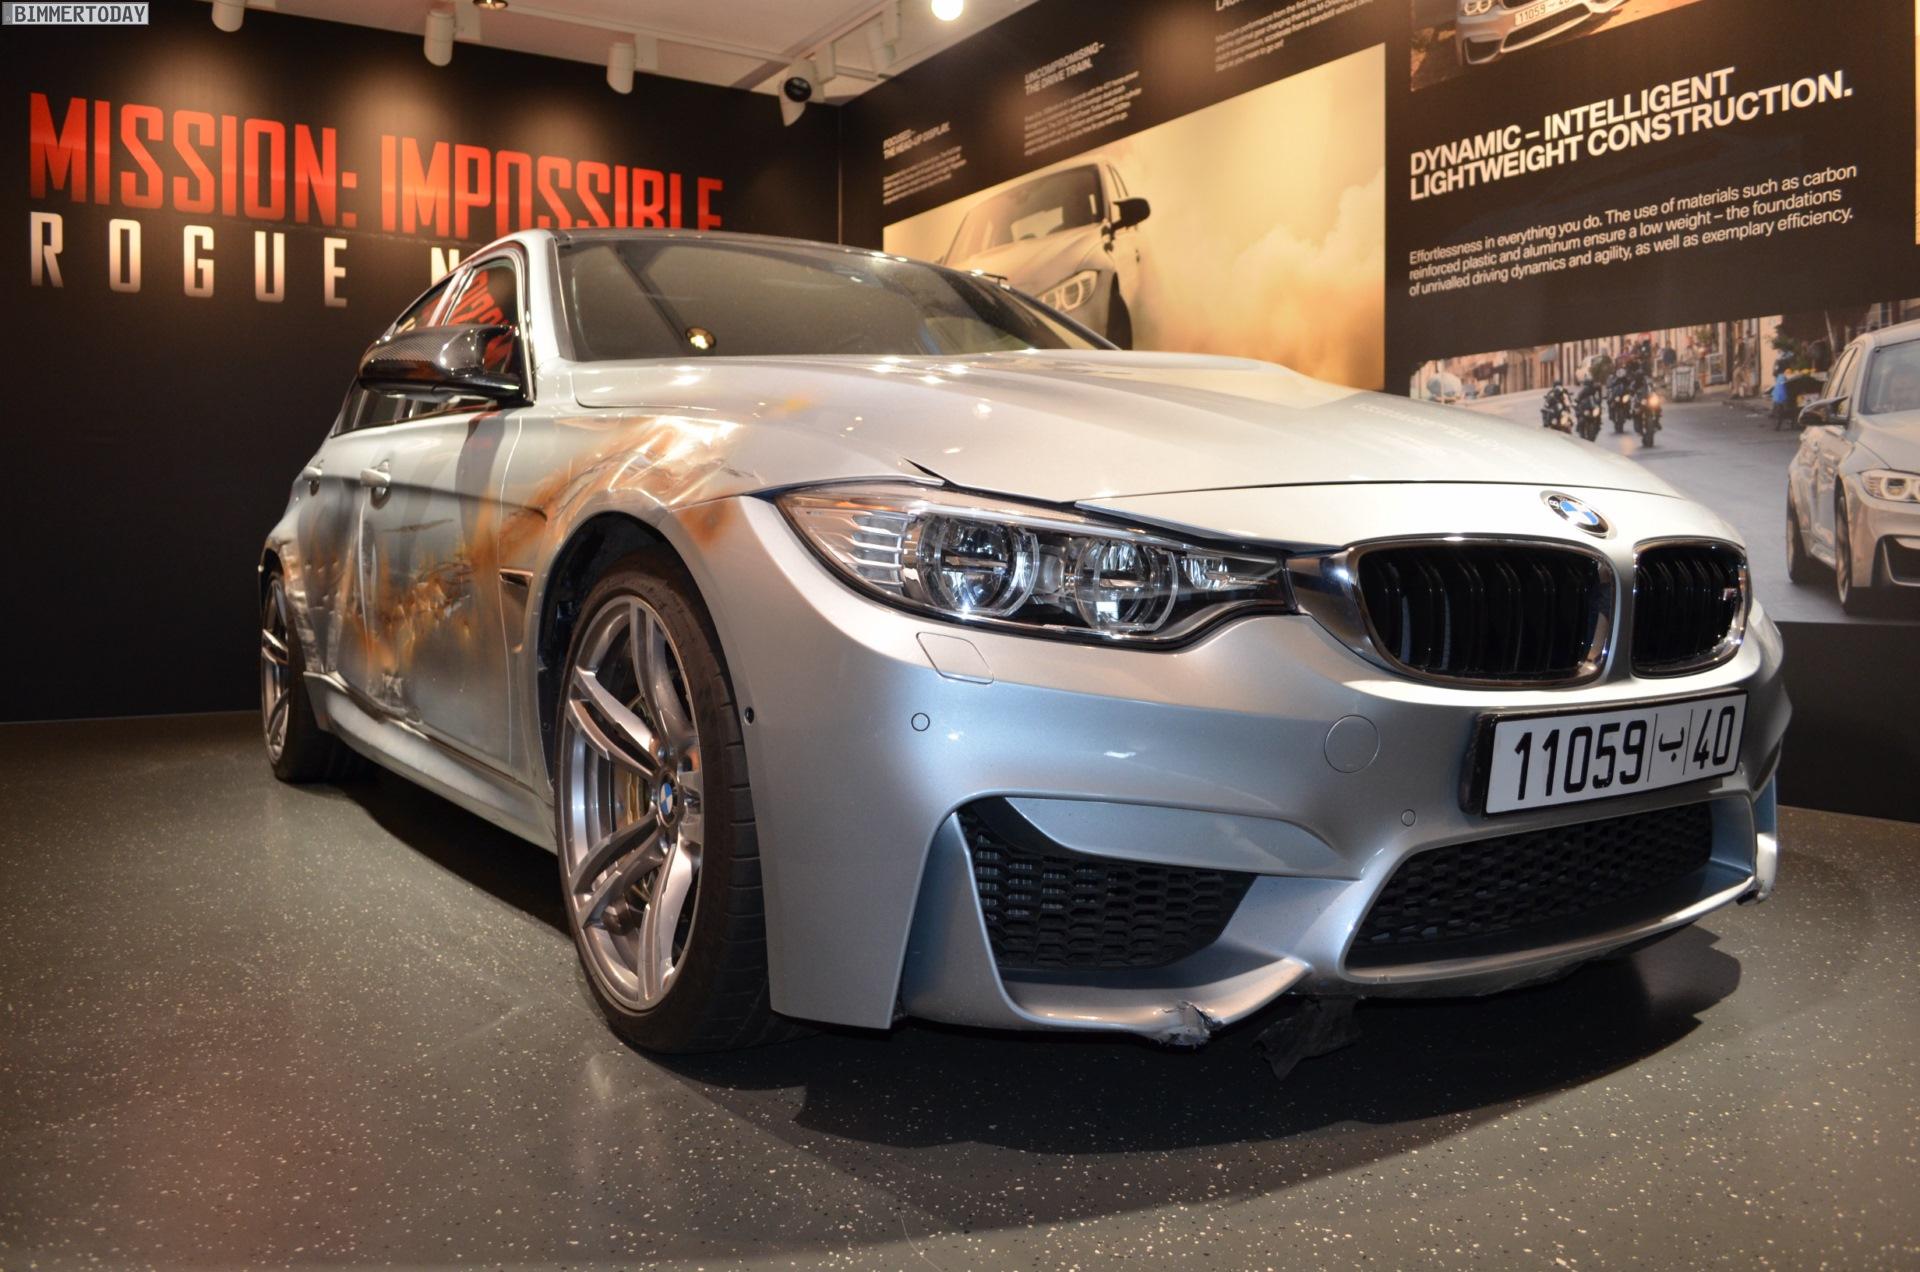 Mission Impossible 5 BMW M3 F80 Crash Film Auto nach Dreharbeiten 04